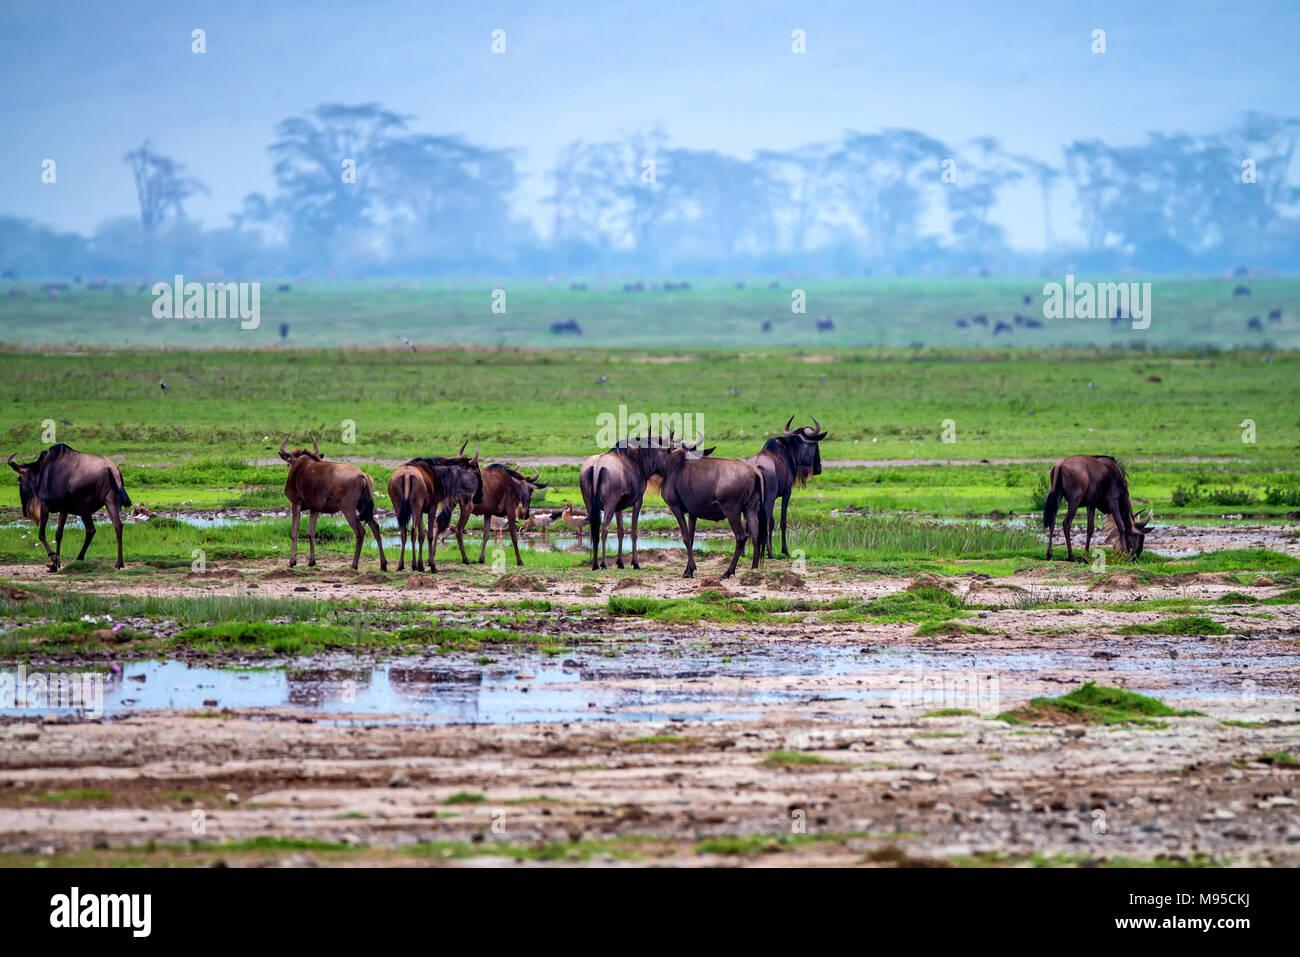 Wildebeests pascolano nella savana Immagini Stock